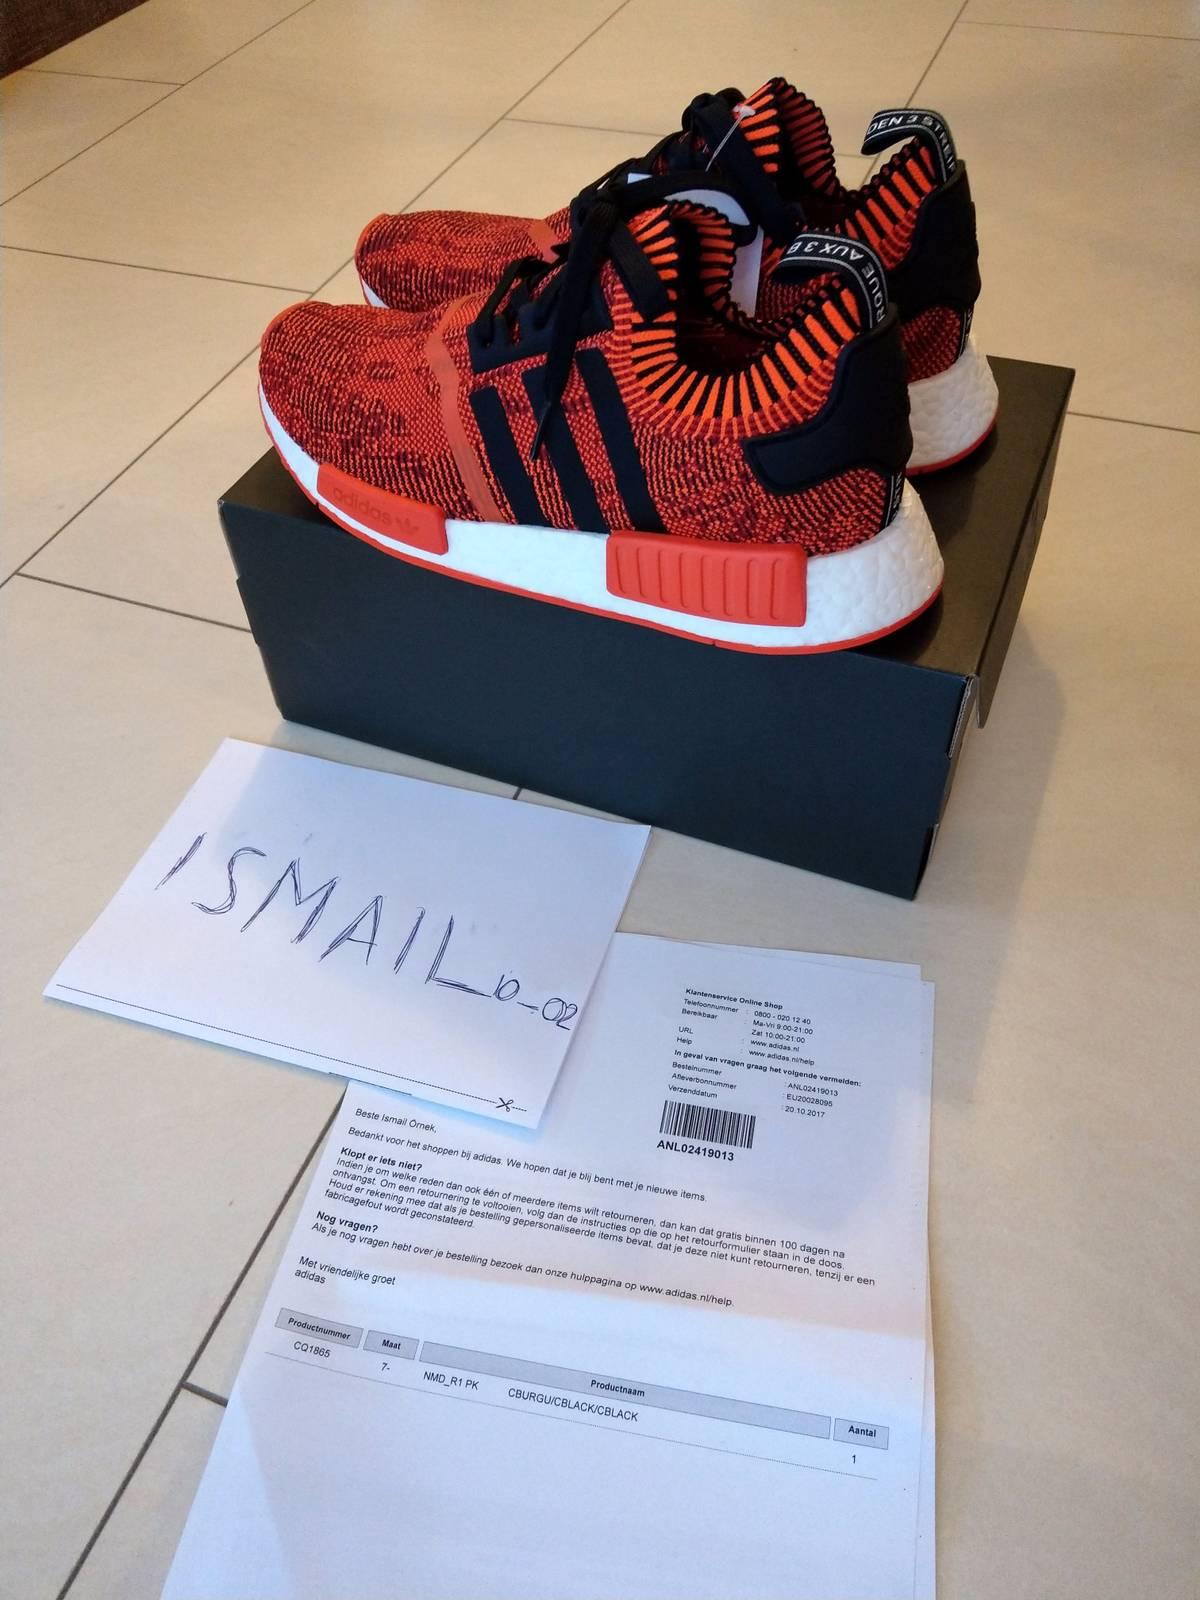 b921d3915ec7 ... adidas nmd r1 pk ai camo red apple 2.0 photo 1 5